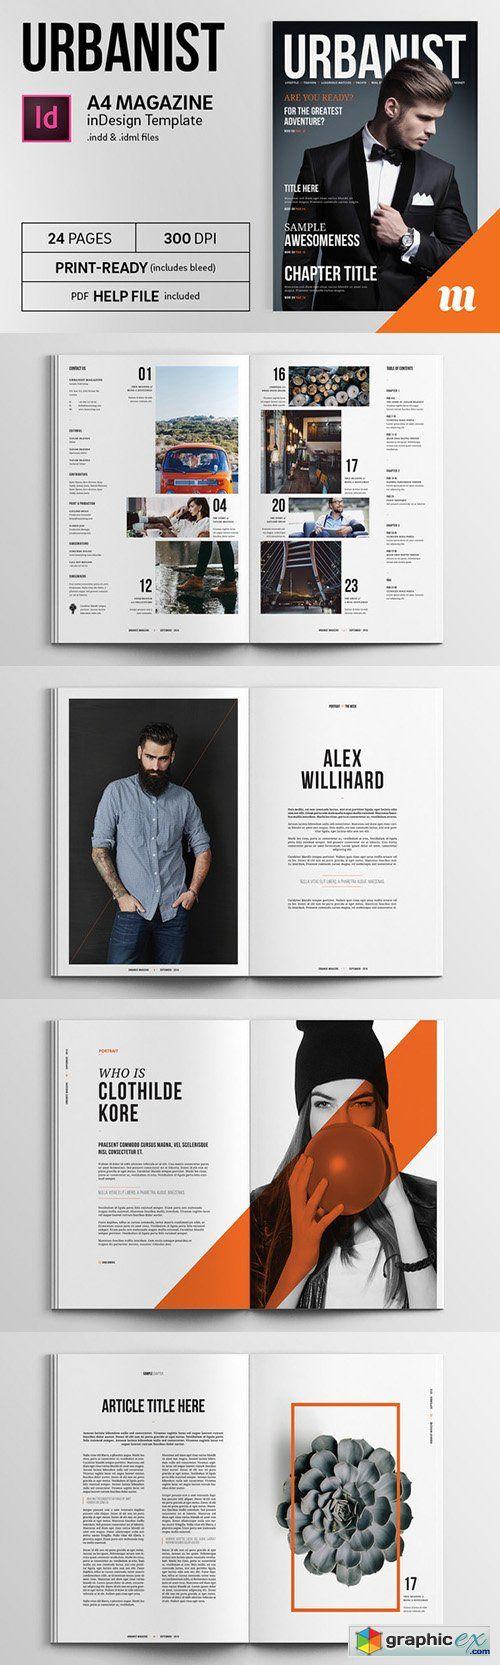 Magazine #cover #templates | Magazine Photography | Pinterest ...